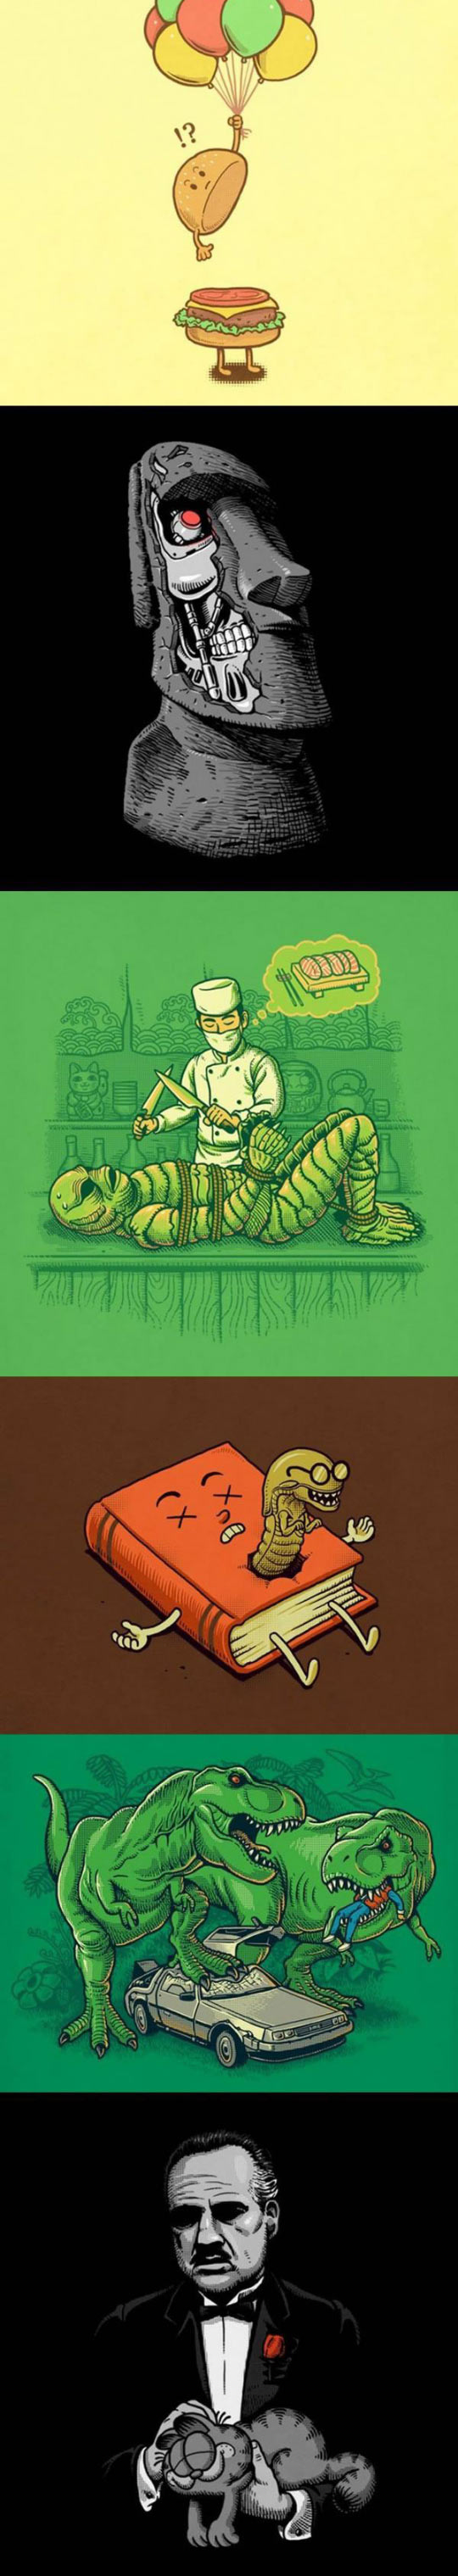 funny-illustrations-Pinocchio-Super-Mario-Alien